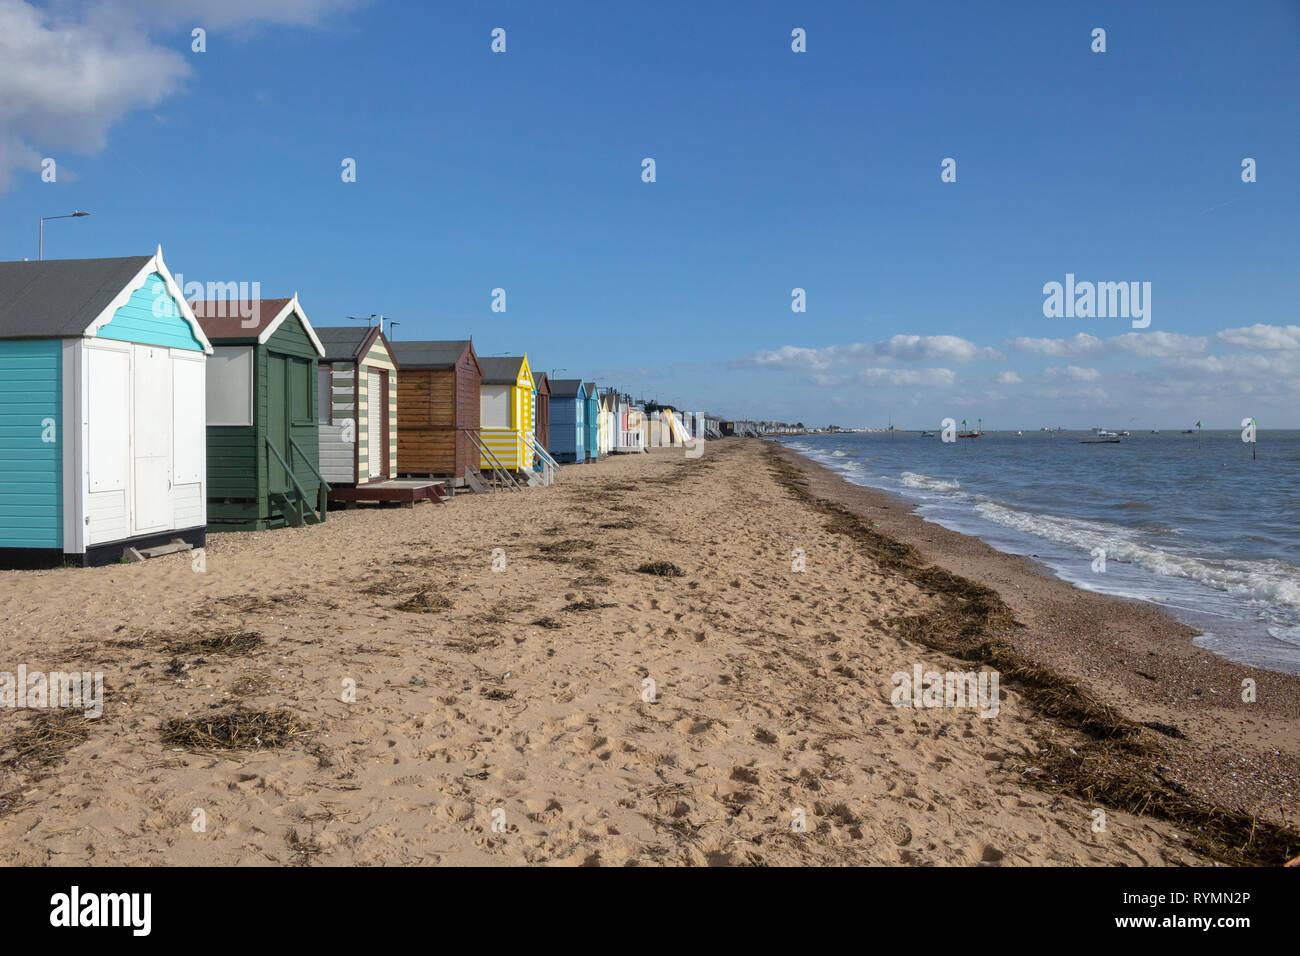 Thorpe Bay beach, near Southend-on-Sea, Essex, England - Stock Image